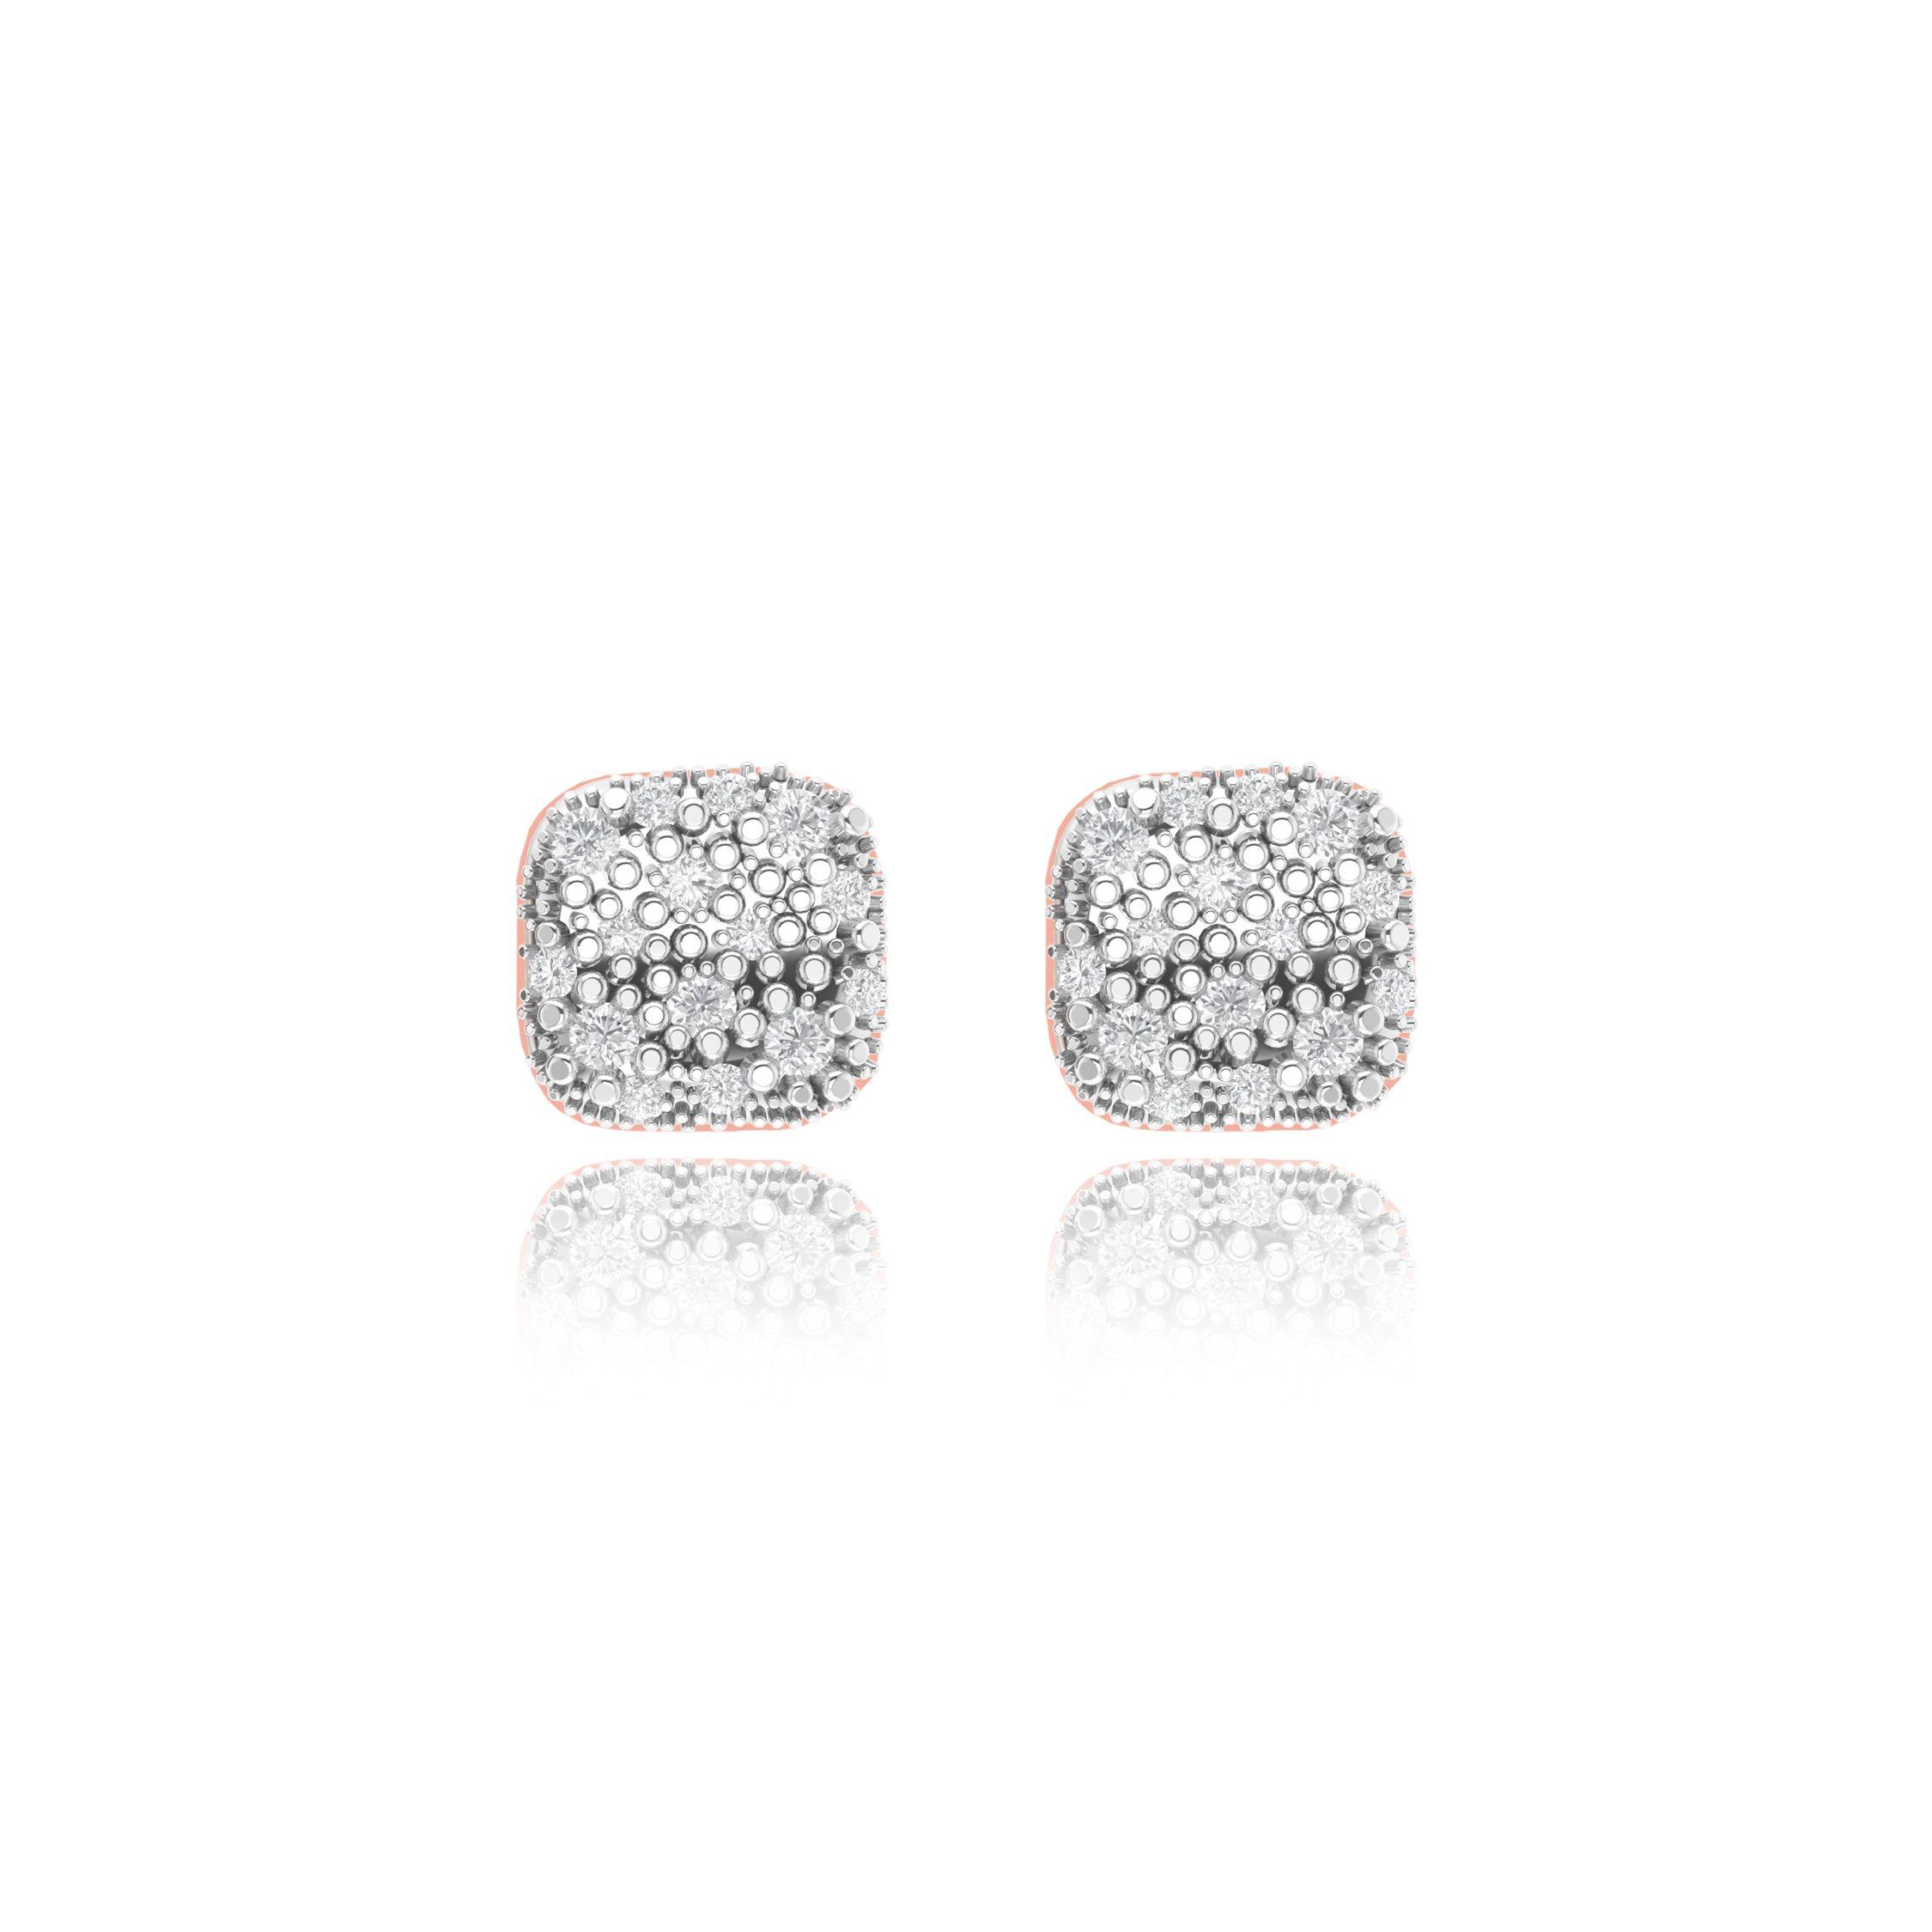 Penelope rose gold pave cushion earrings